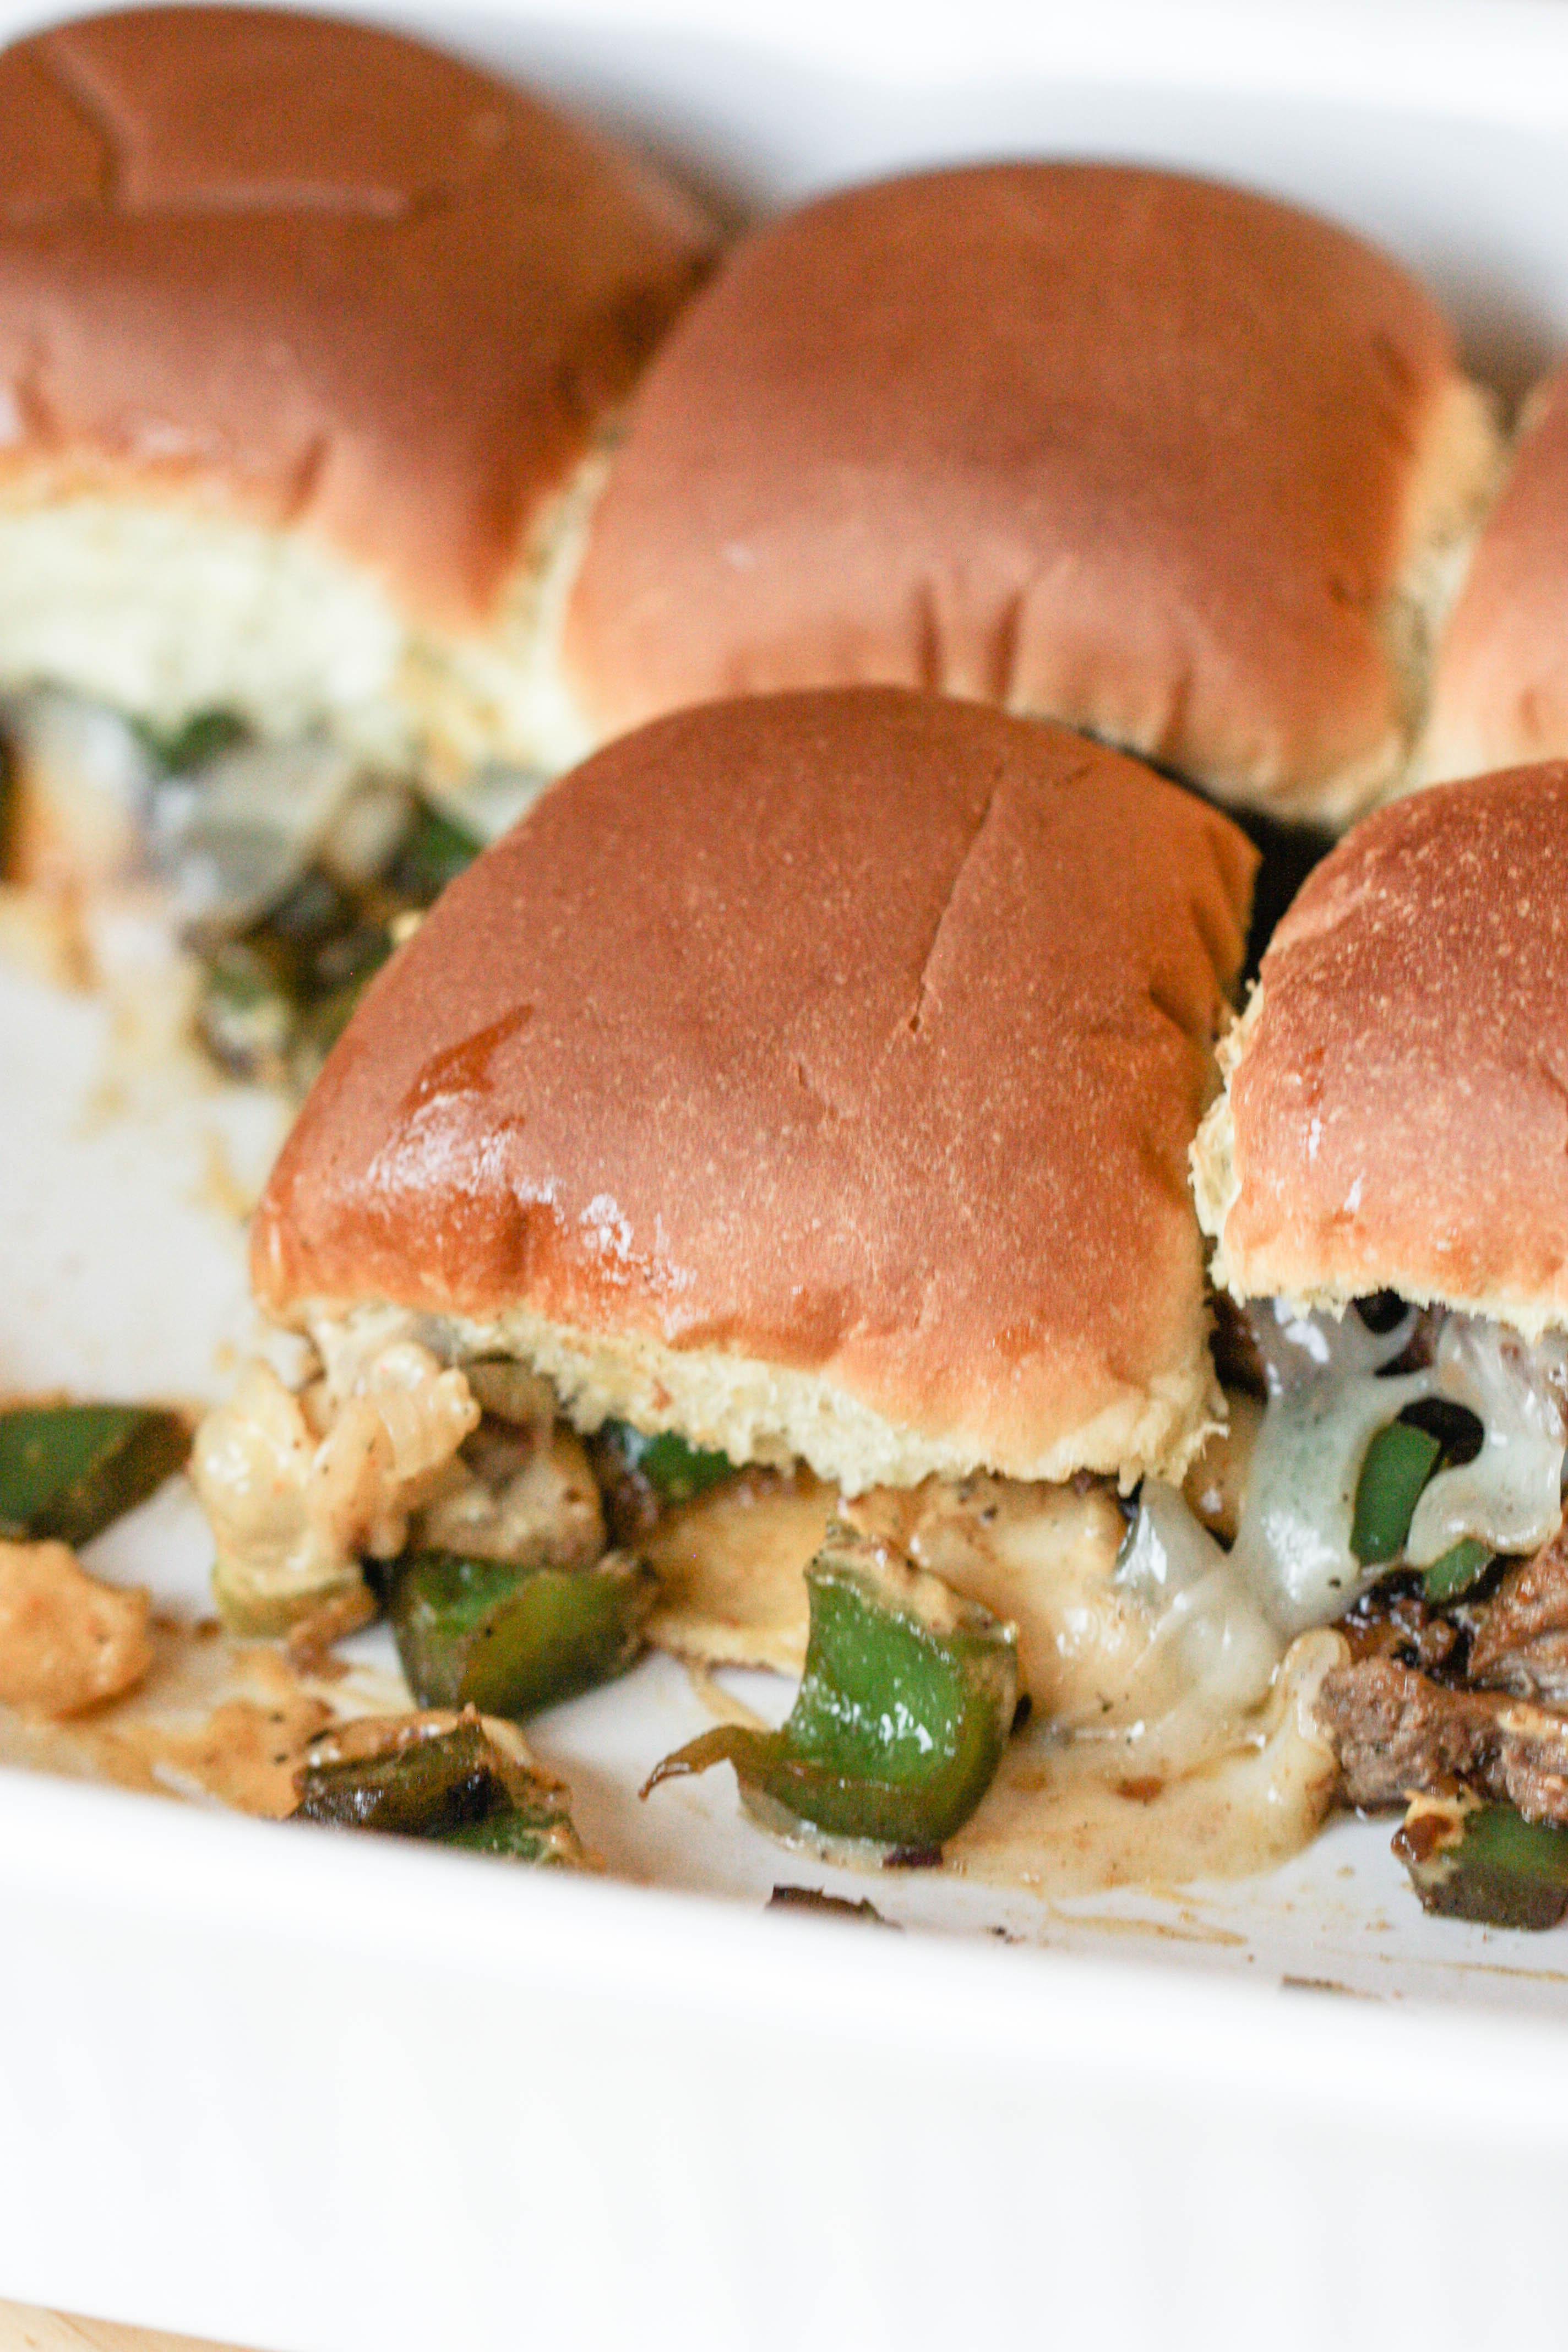 Philly Swiss and Steak Sliders Recipe